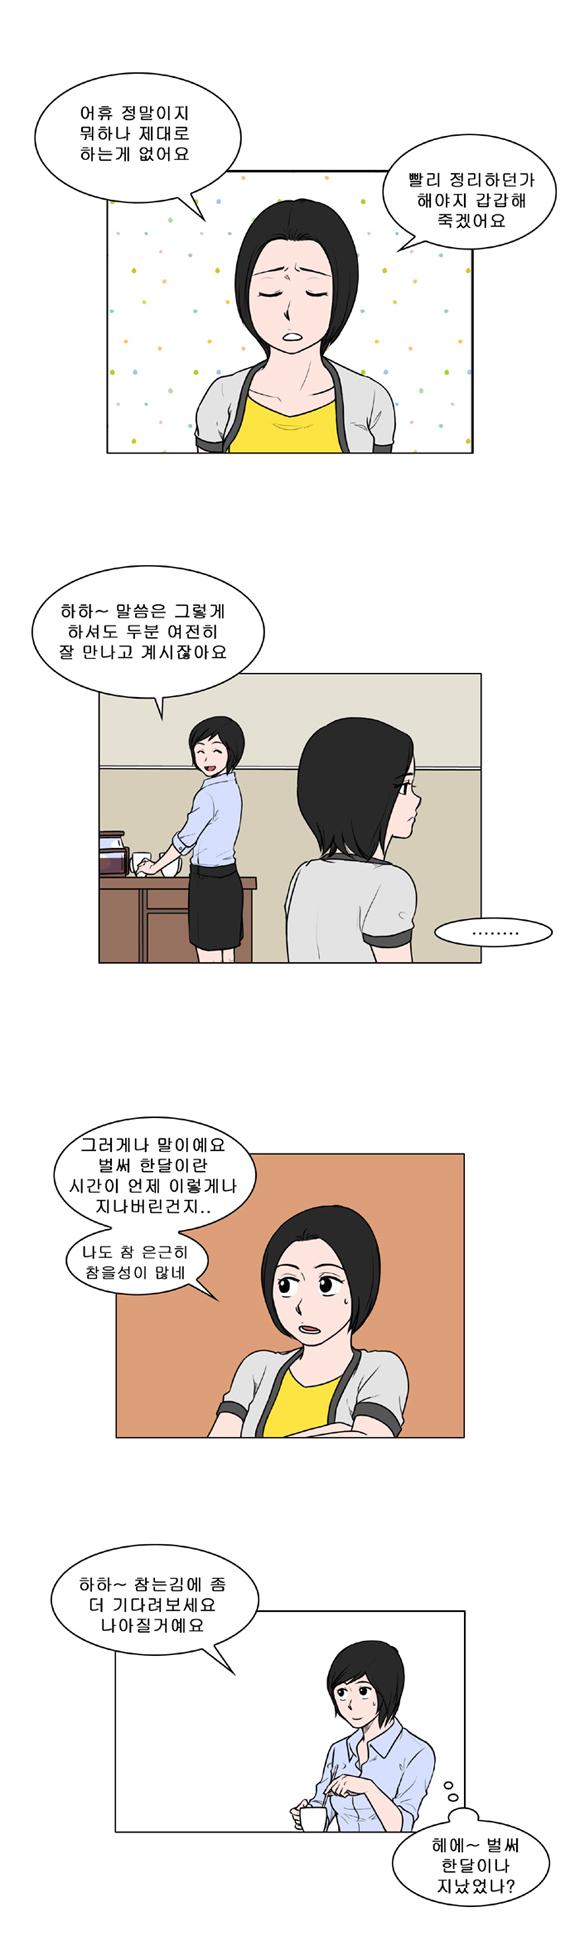 duocartoon_16_01.jpg